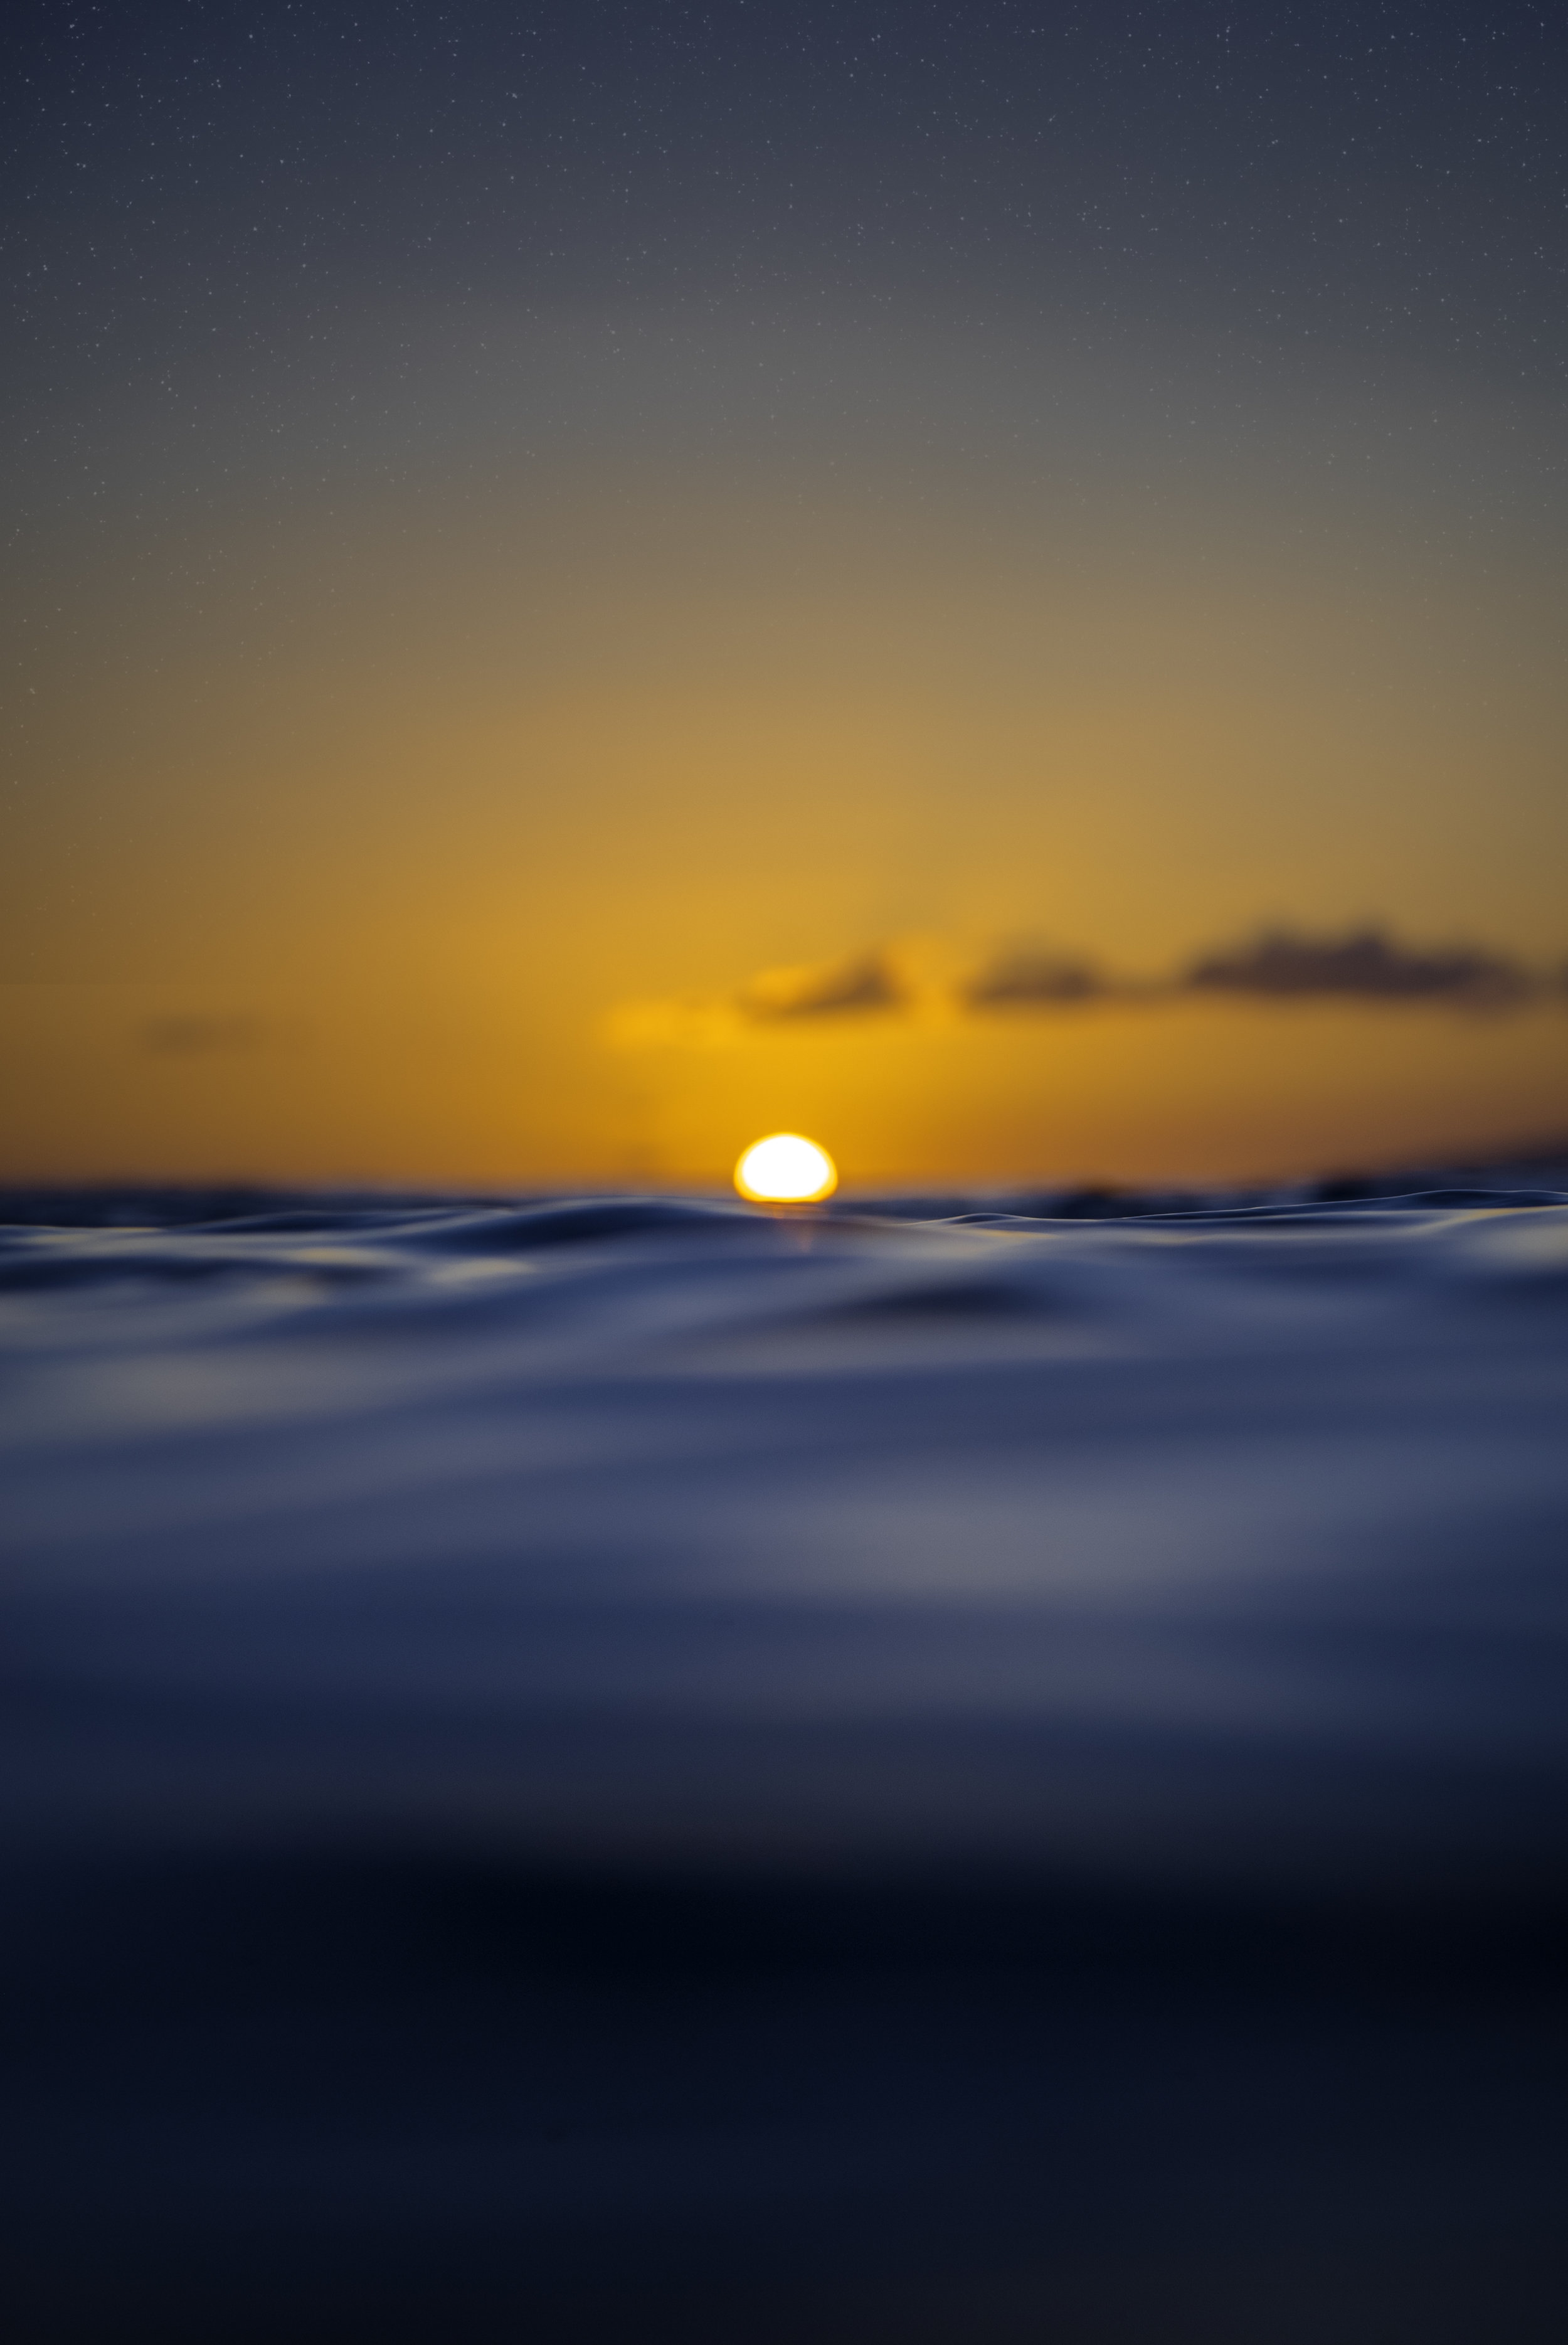 sun and ocean sunset kiss.jpg